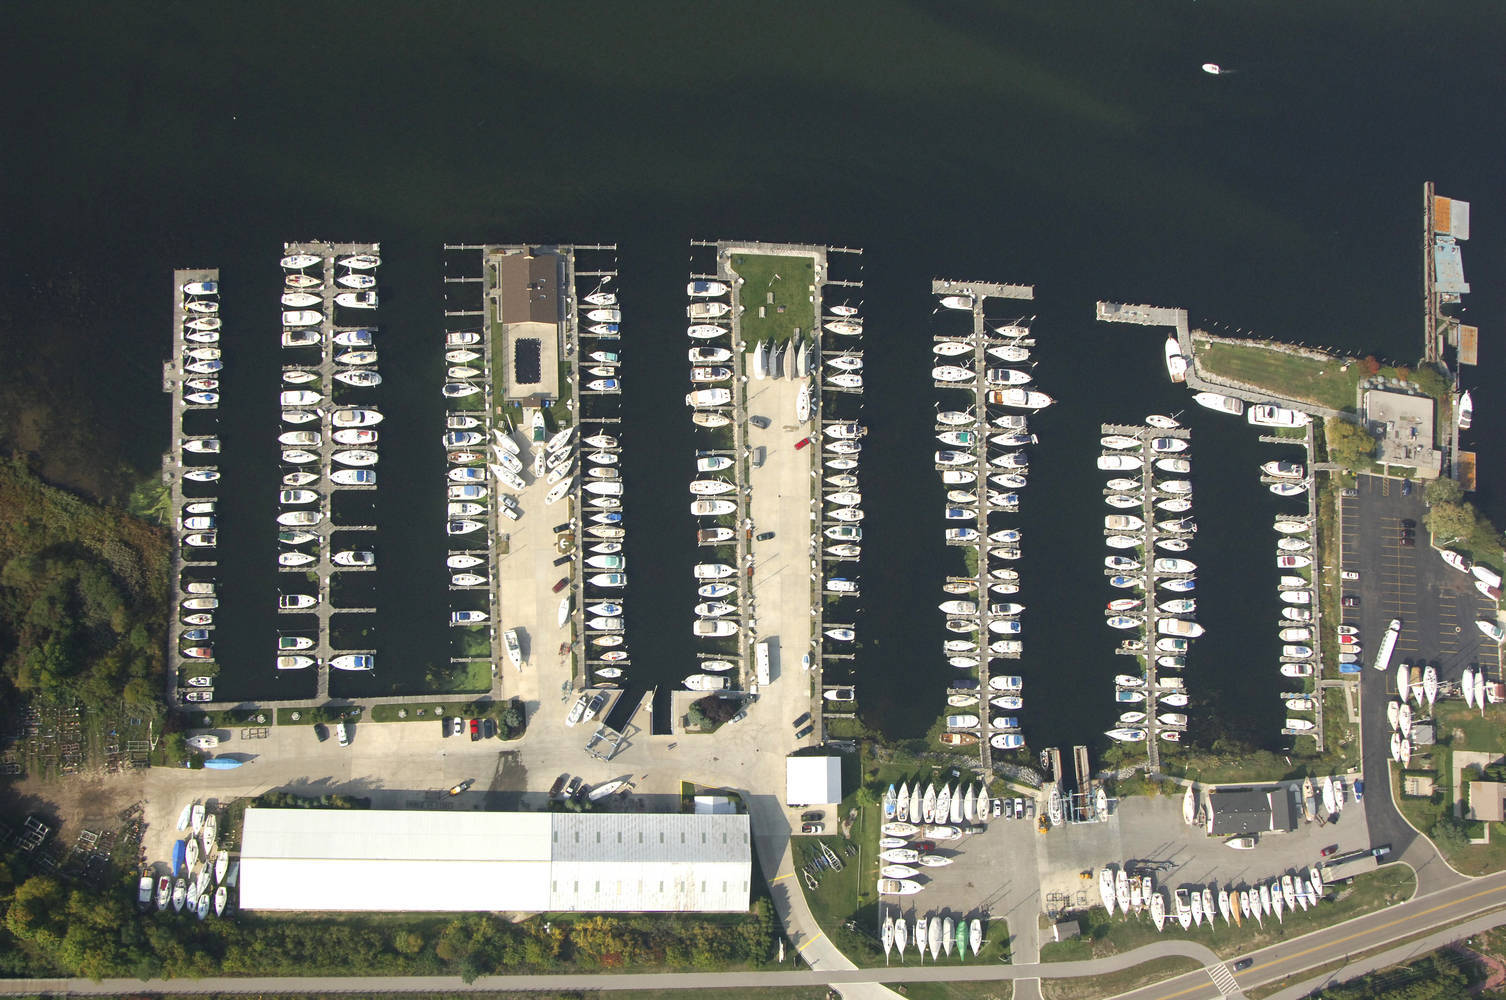 Whitehall Landing Marina Slip Dock Mooring Reservations